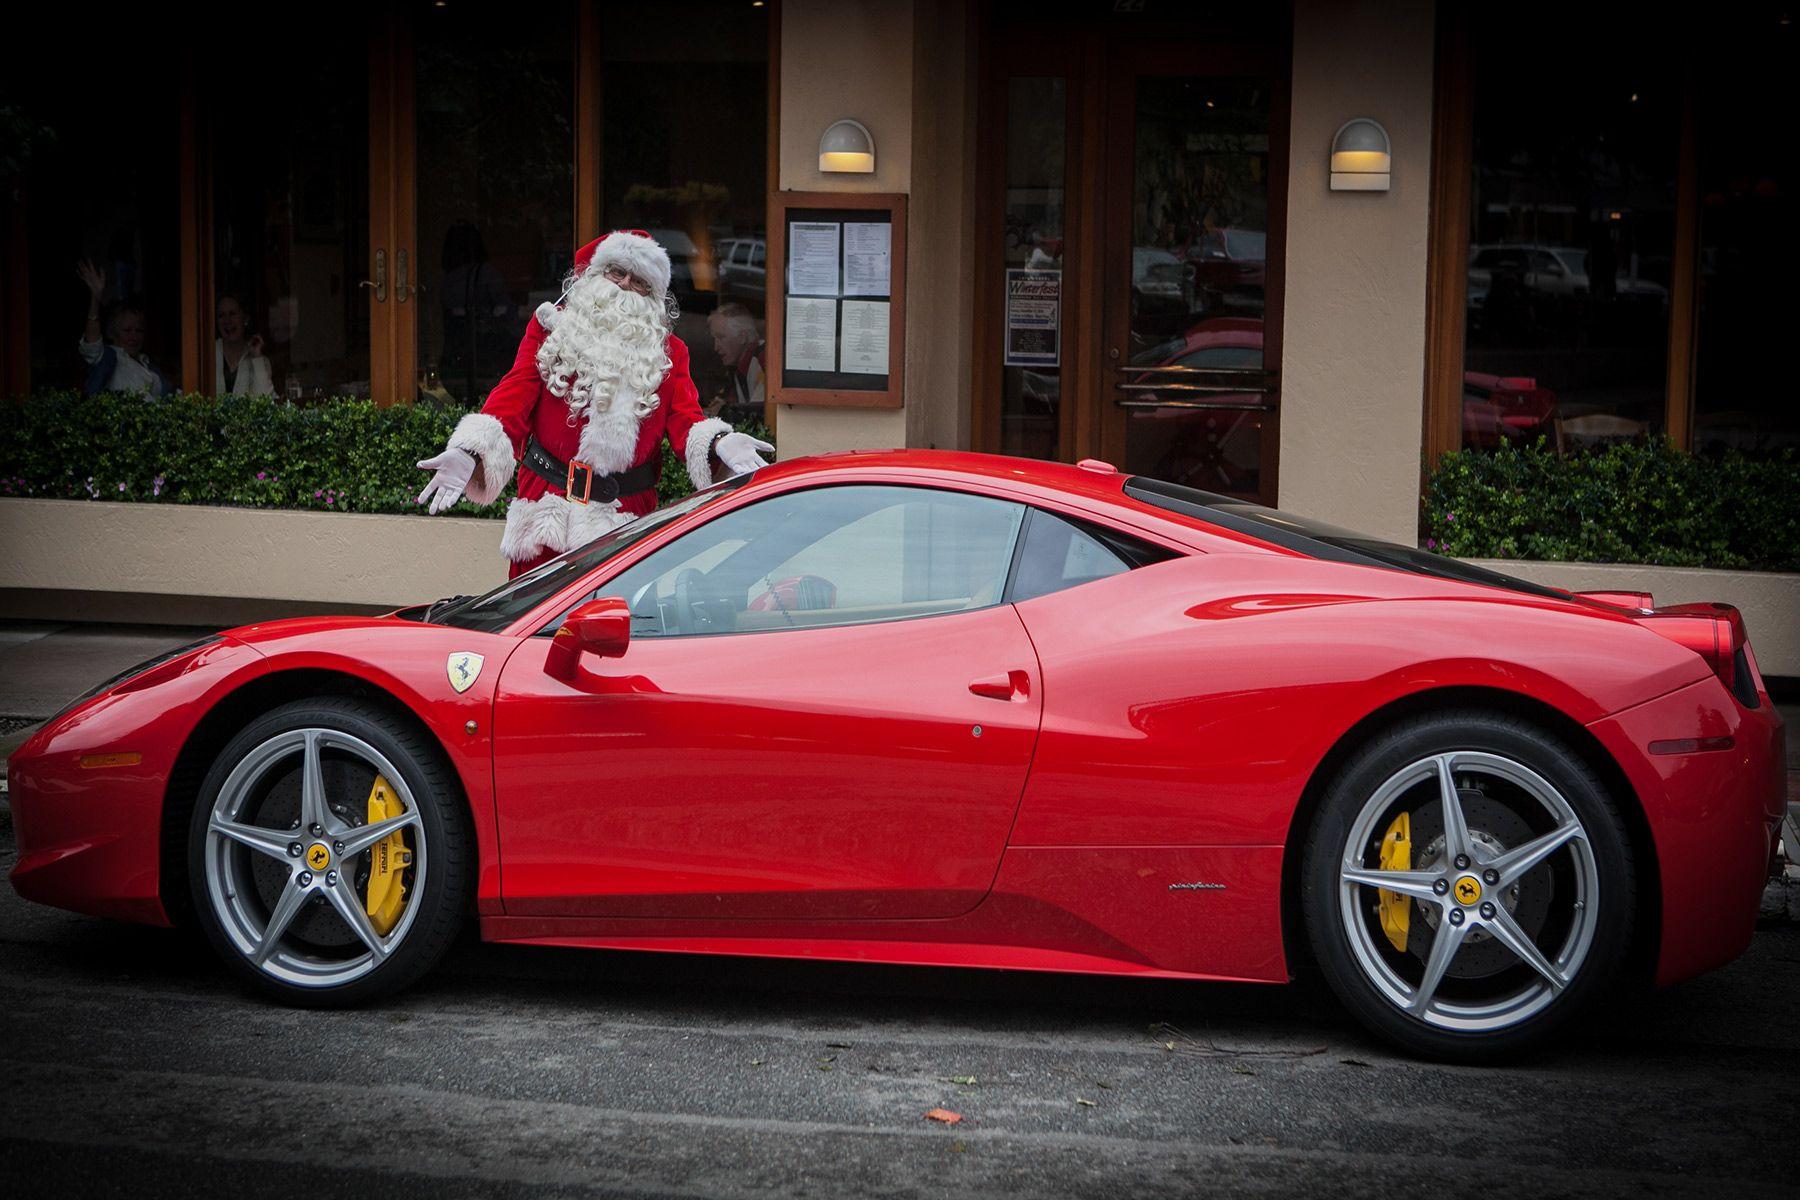 Santa Ferrari